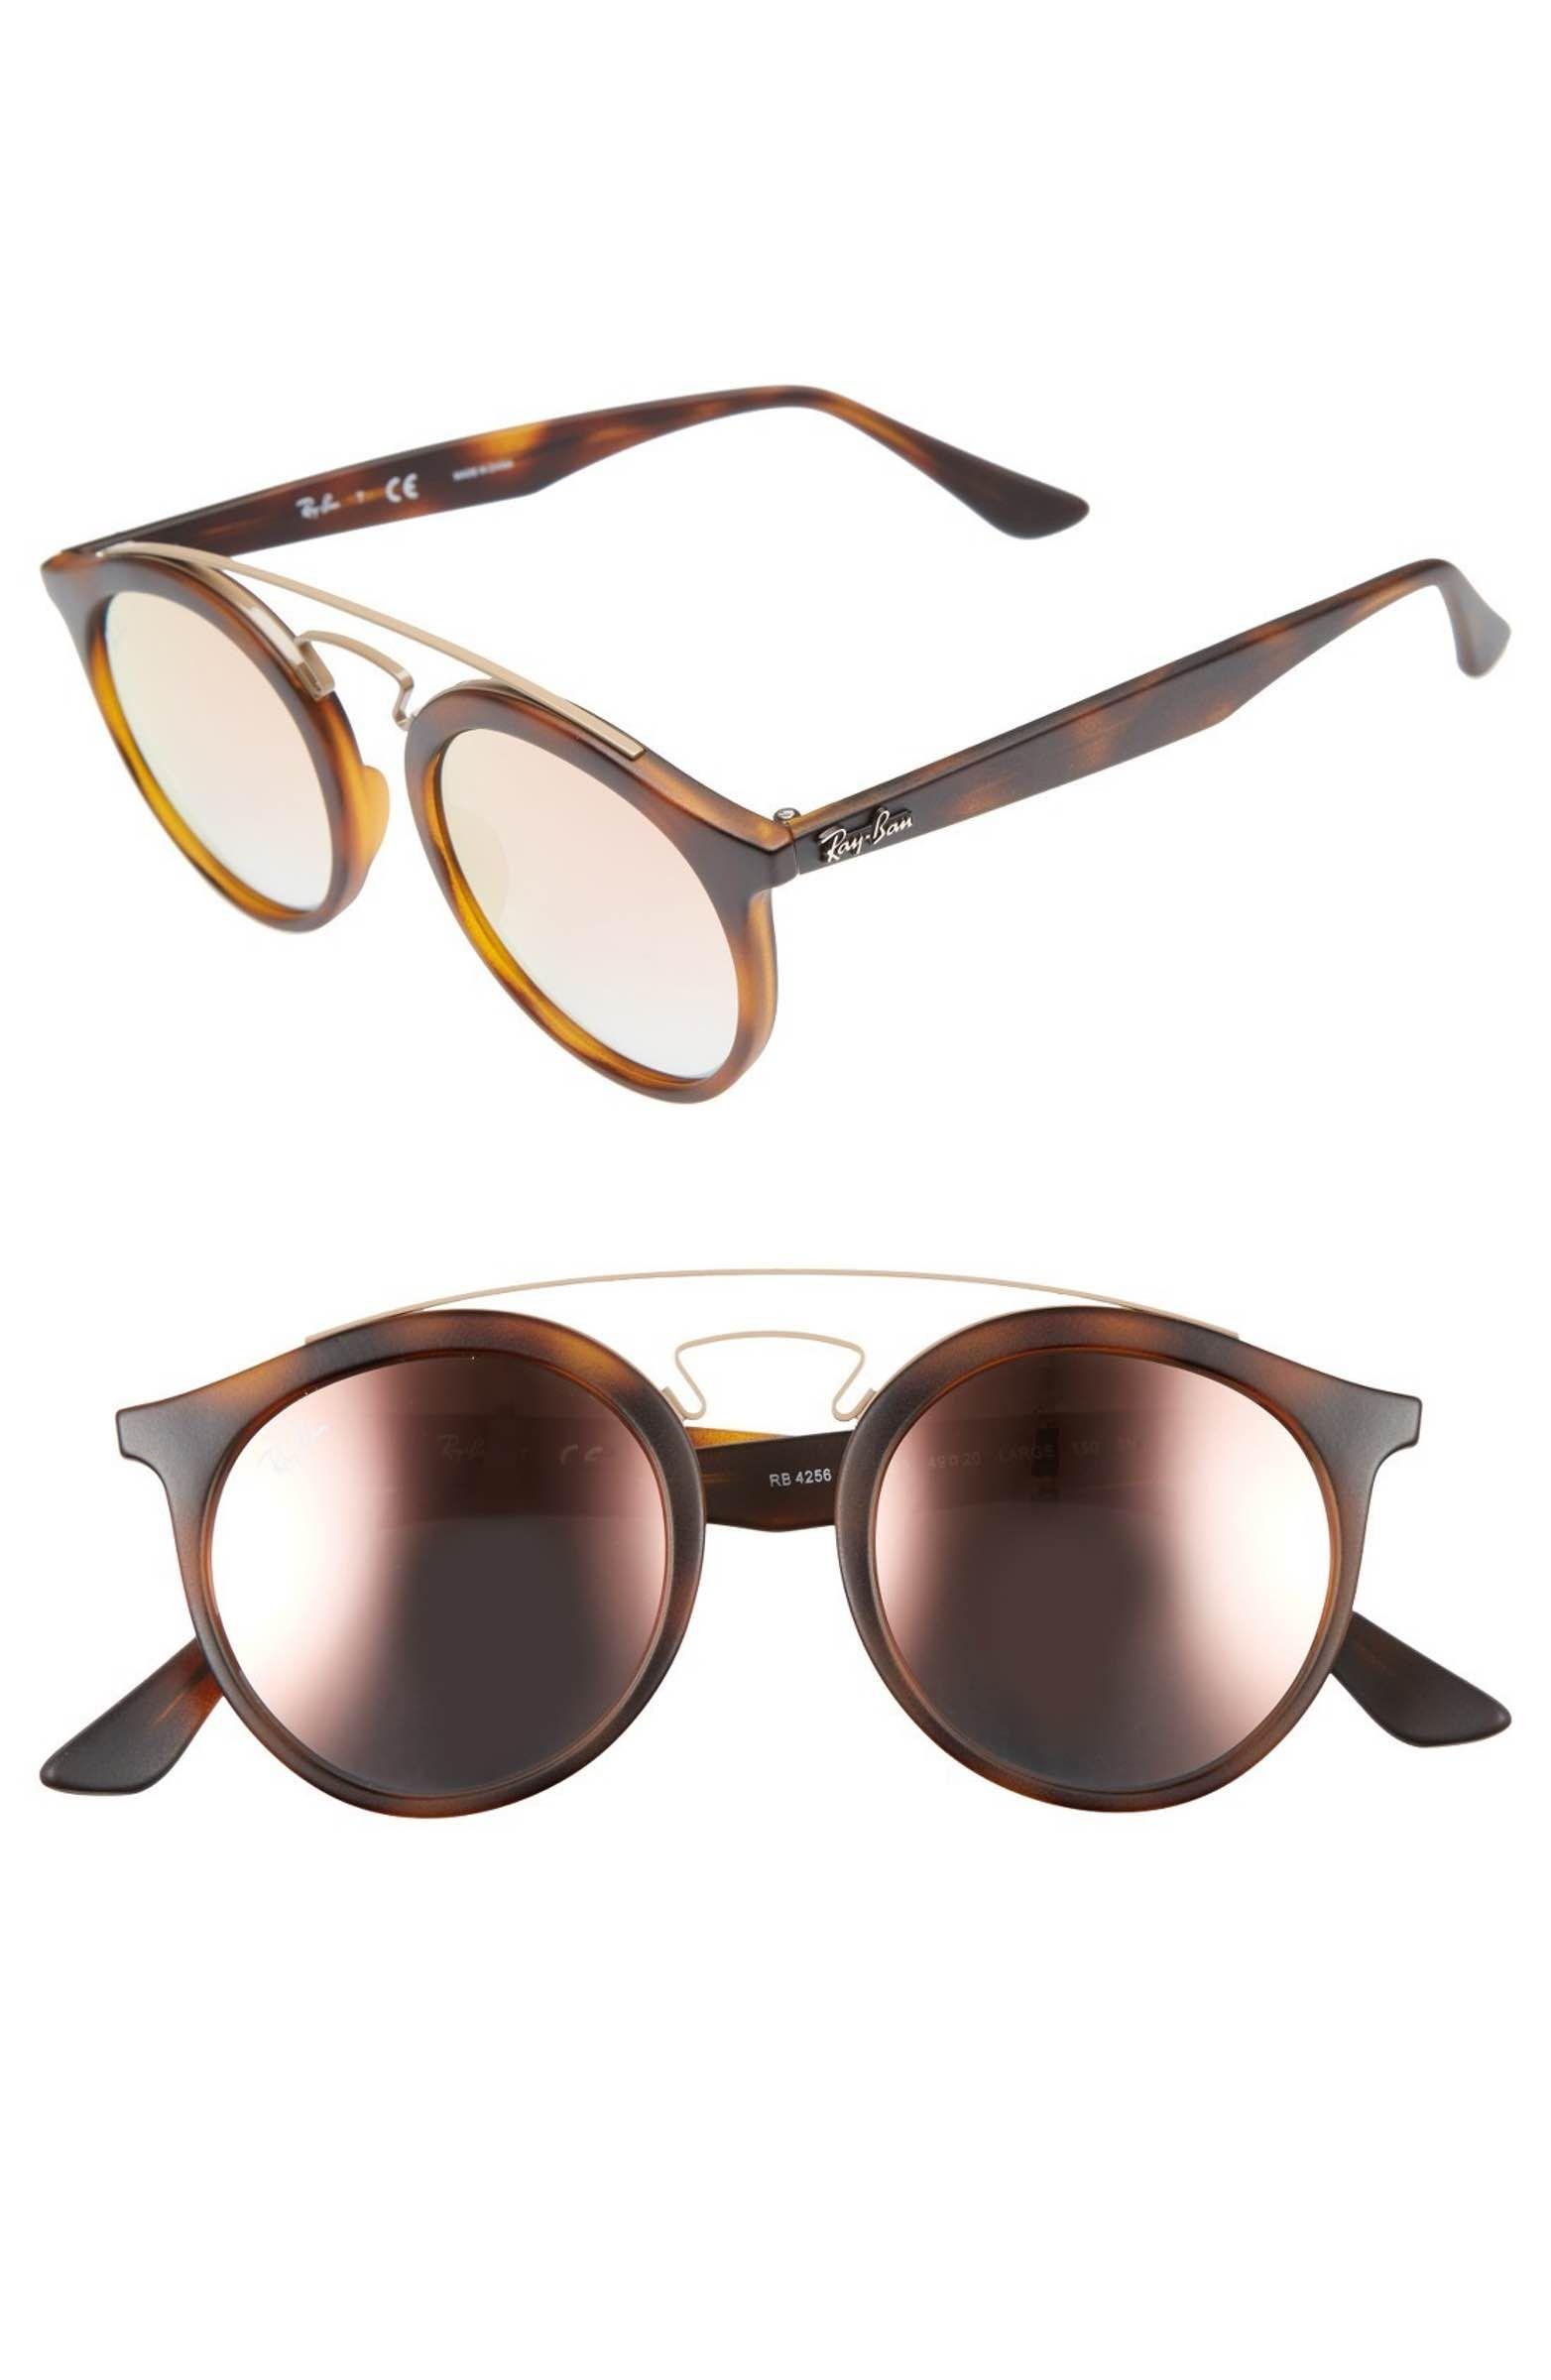 54a552f358 Main Image - Ray-Ban Highstreet 49mm Gatsby Round Sunglasses